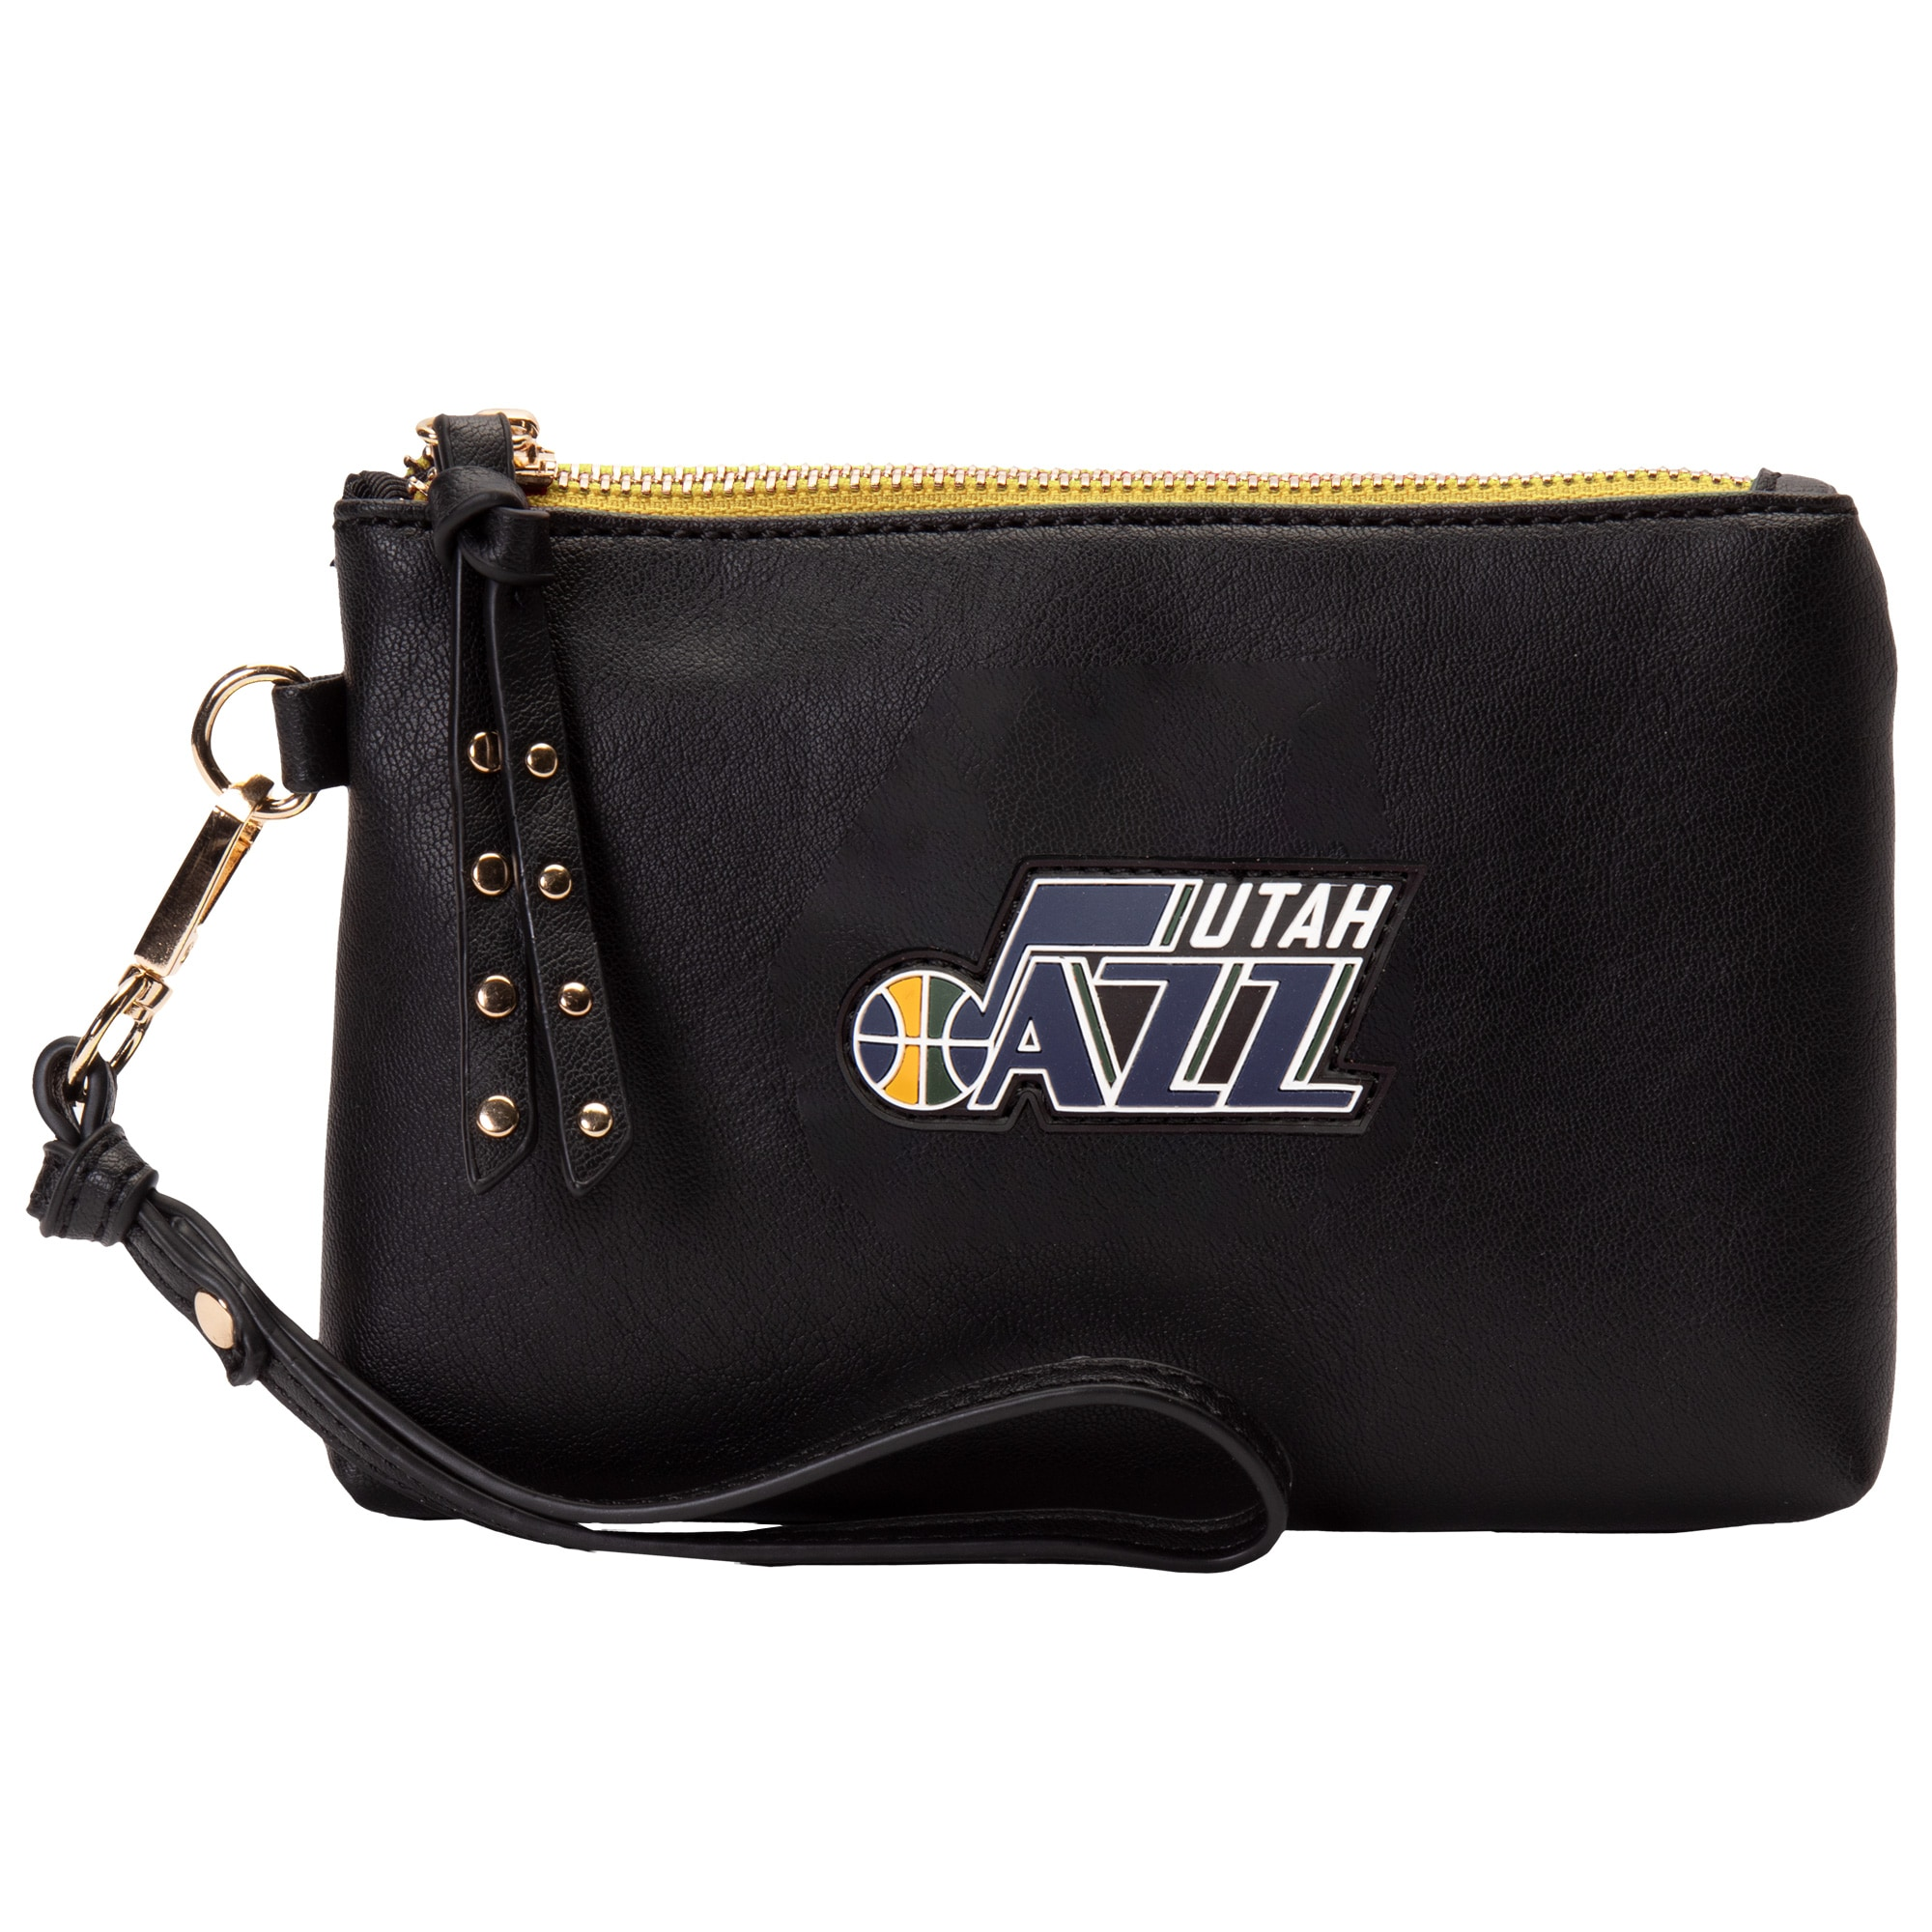 Utah Jazz Wristlet Pouch